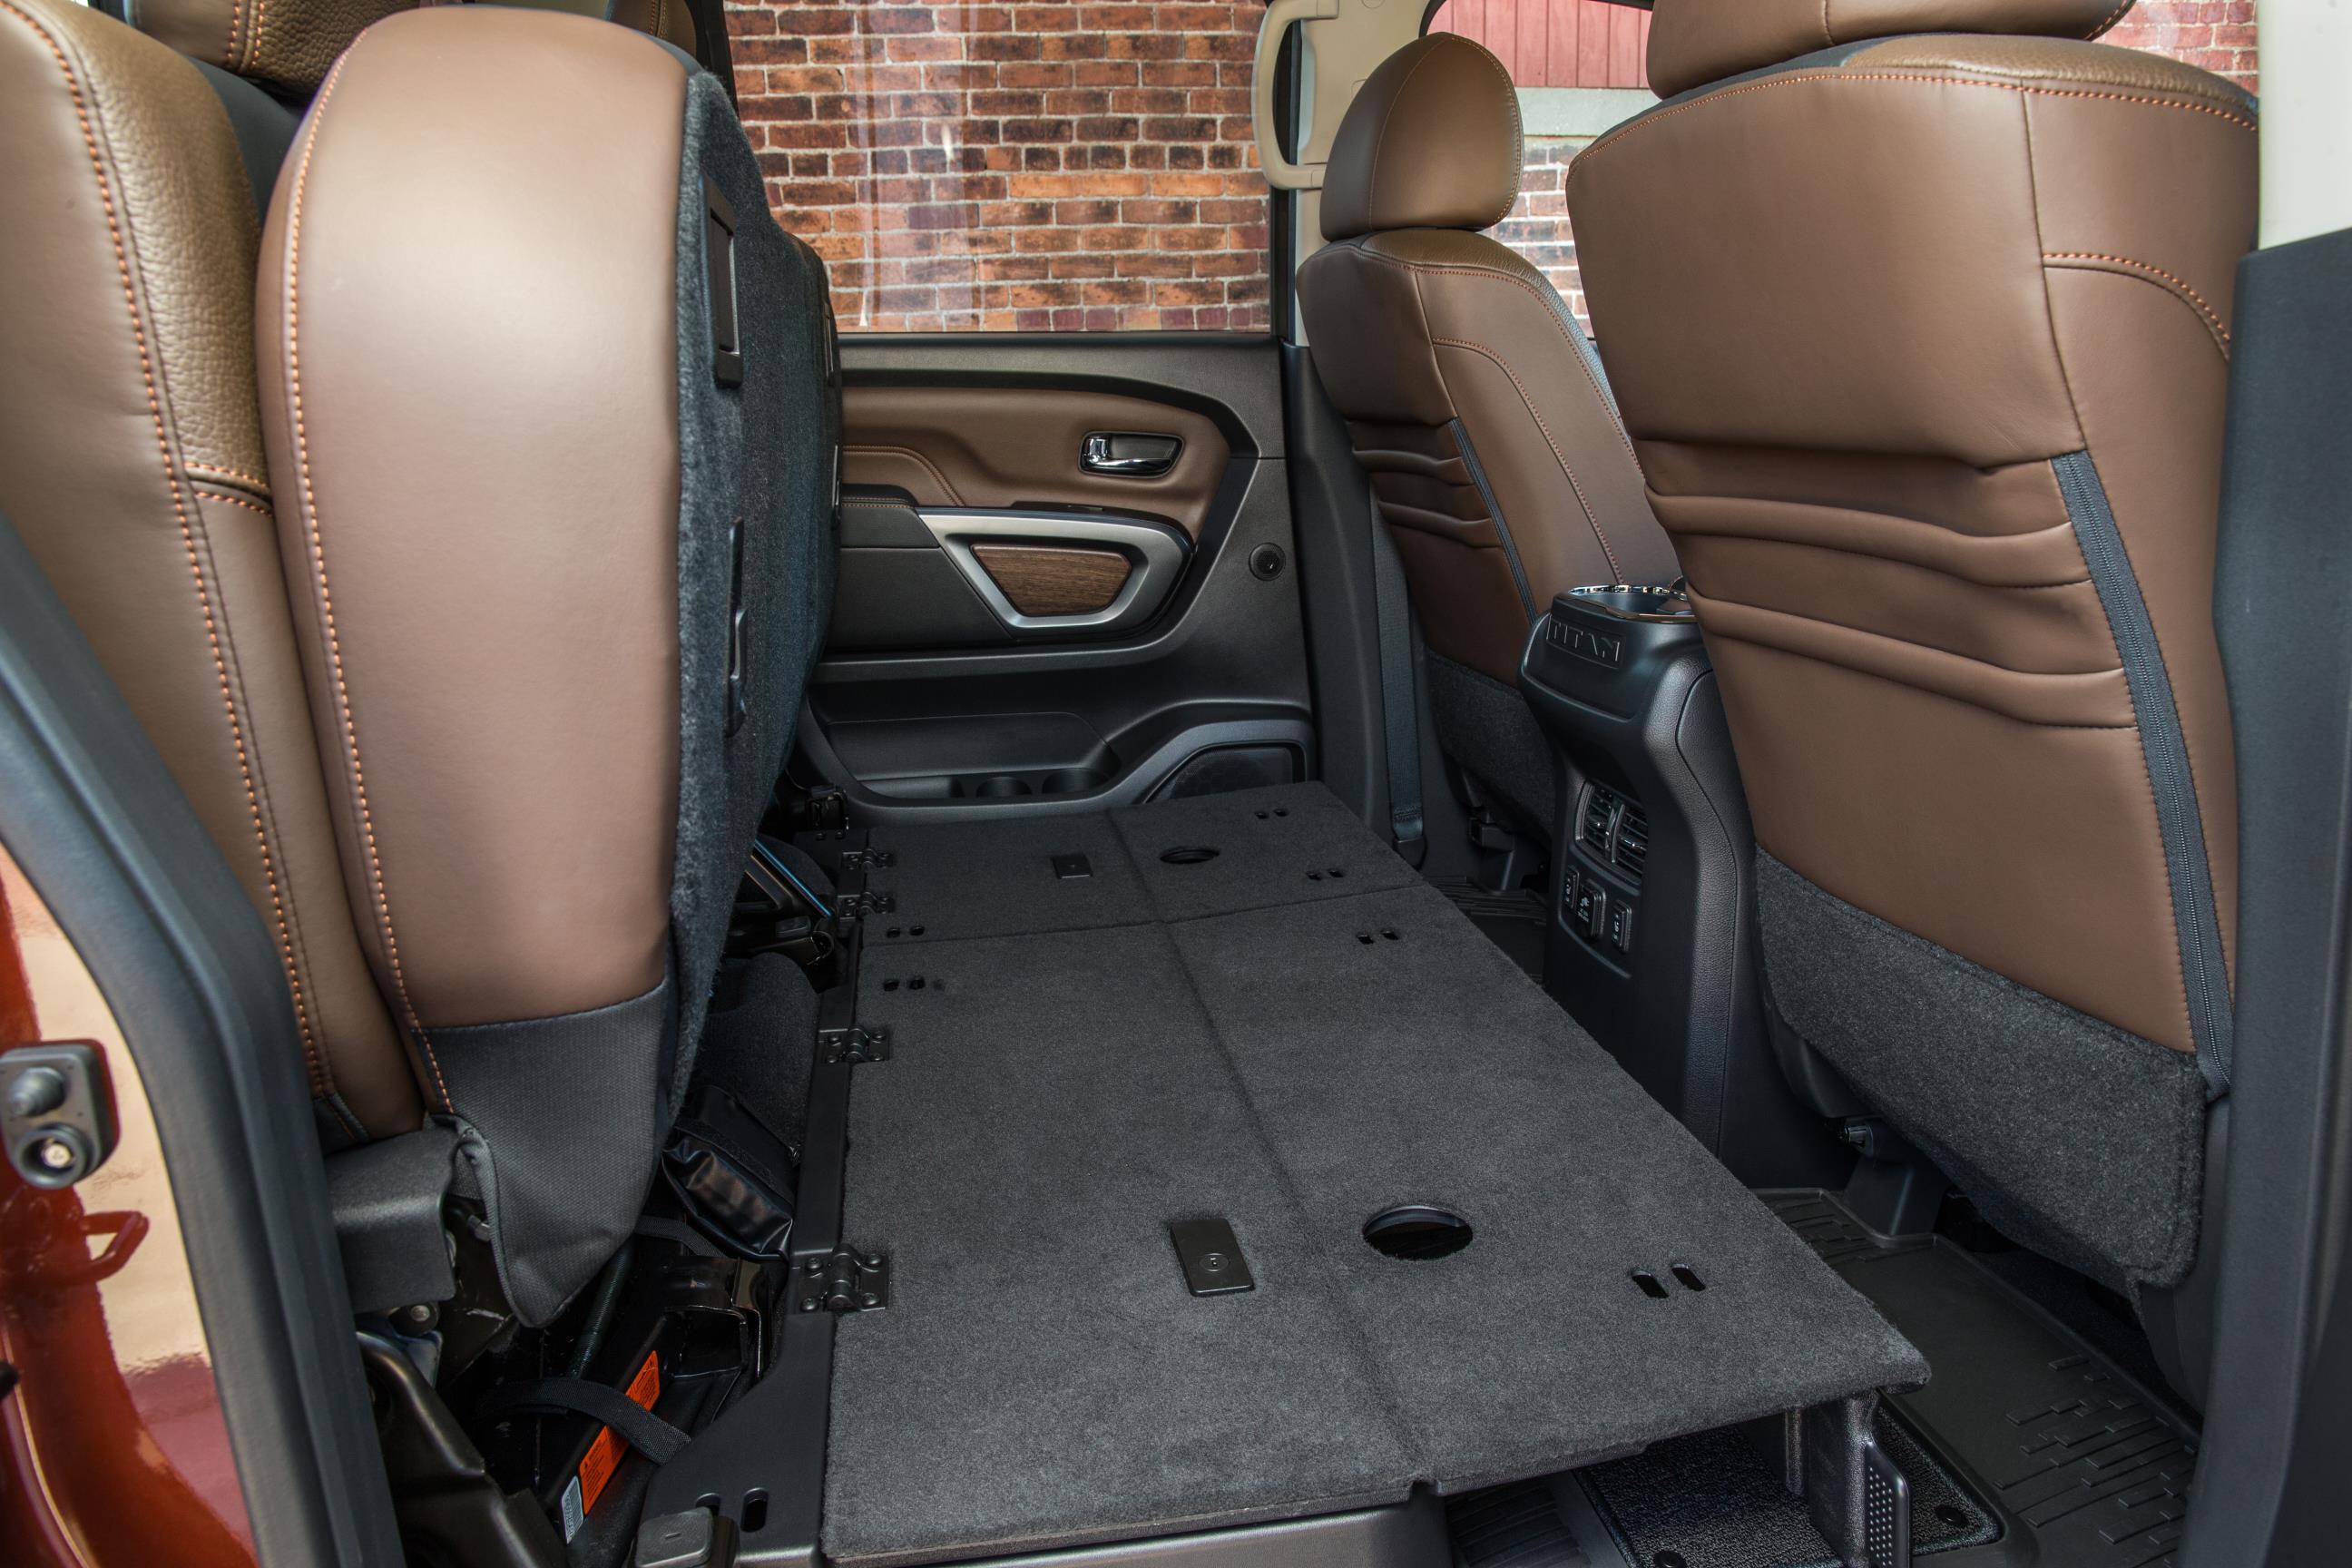 2016 Nissan Titan XD 5.6 V8 Price Announced, 2017 Nissan ...